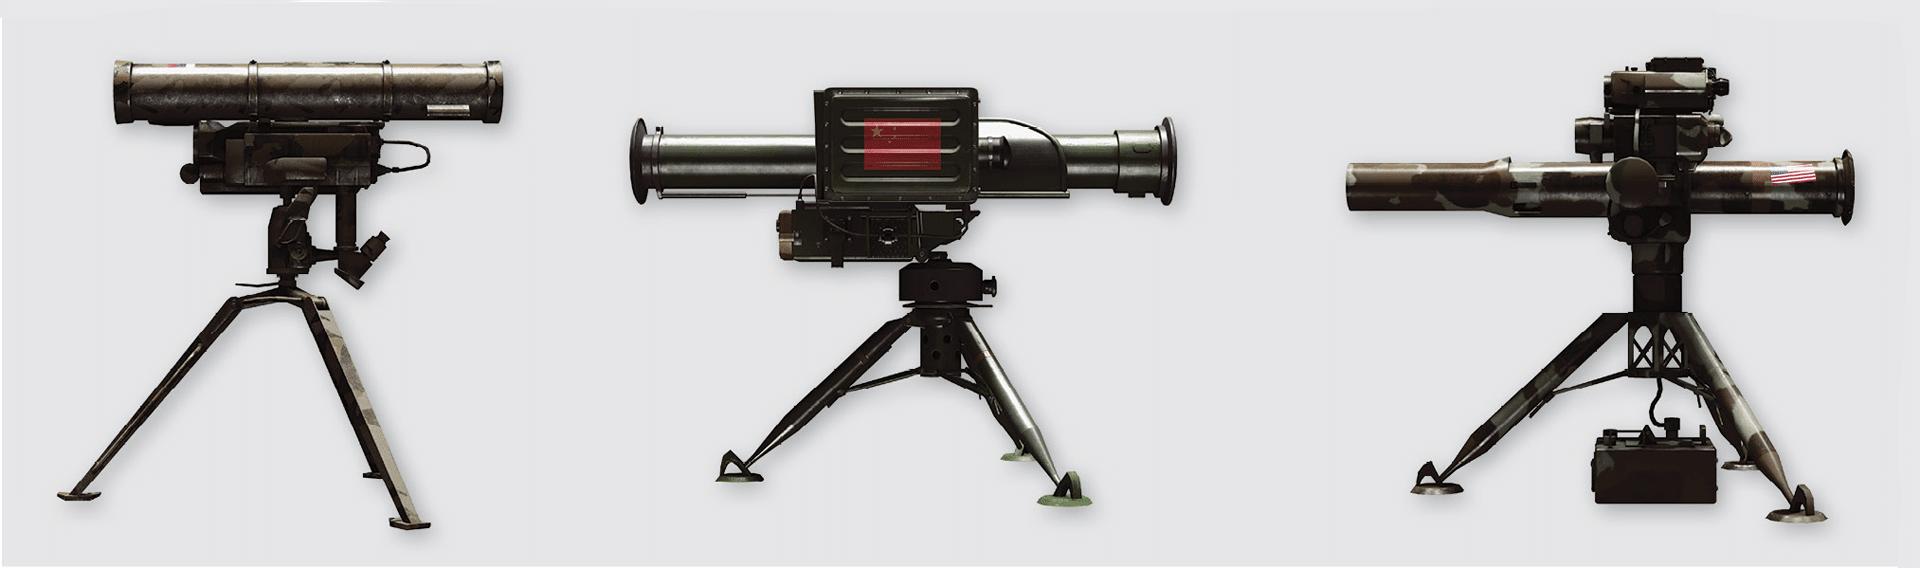 anti-tank_launcher